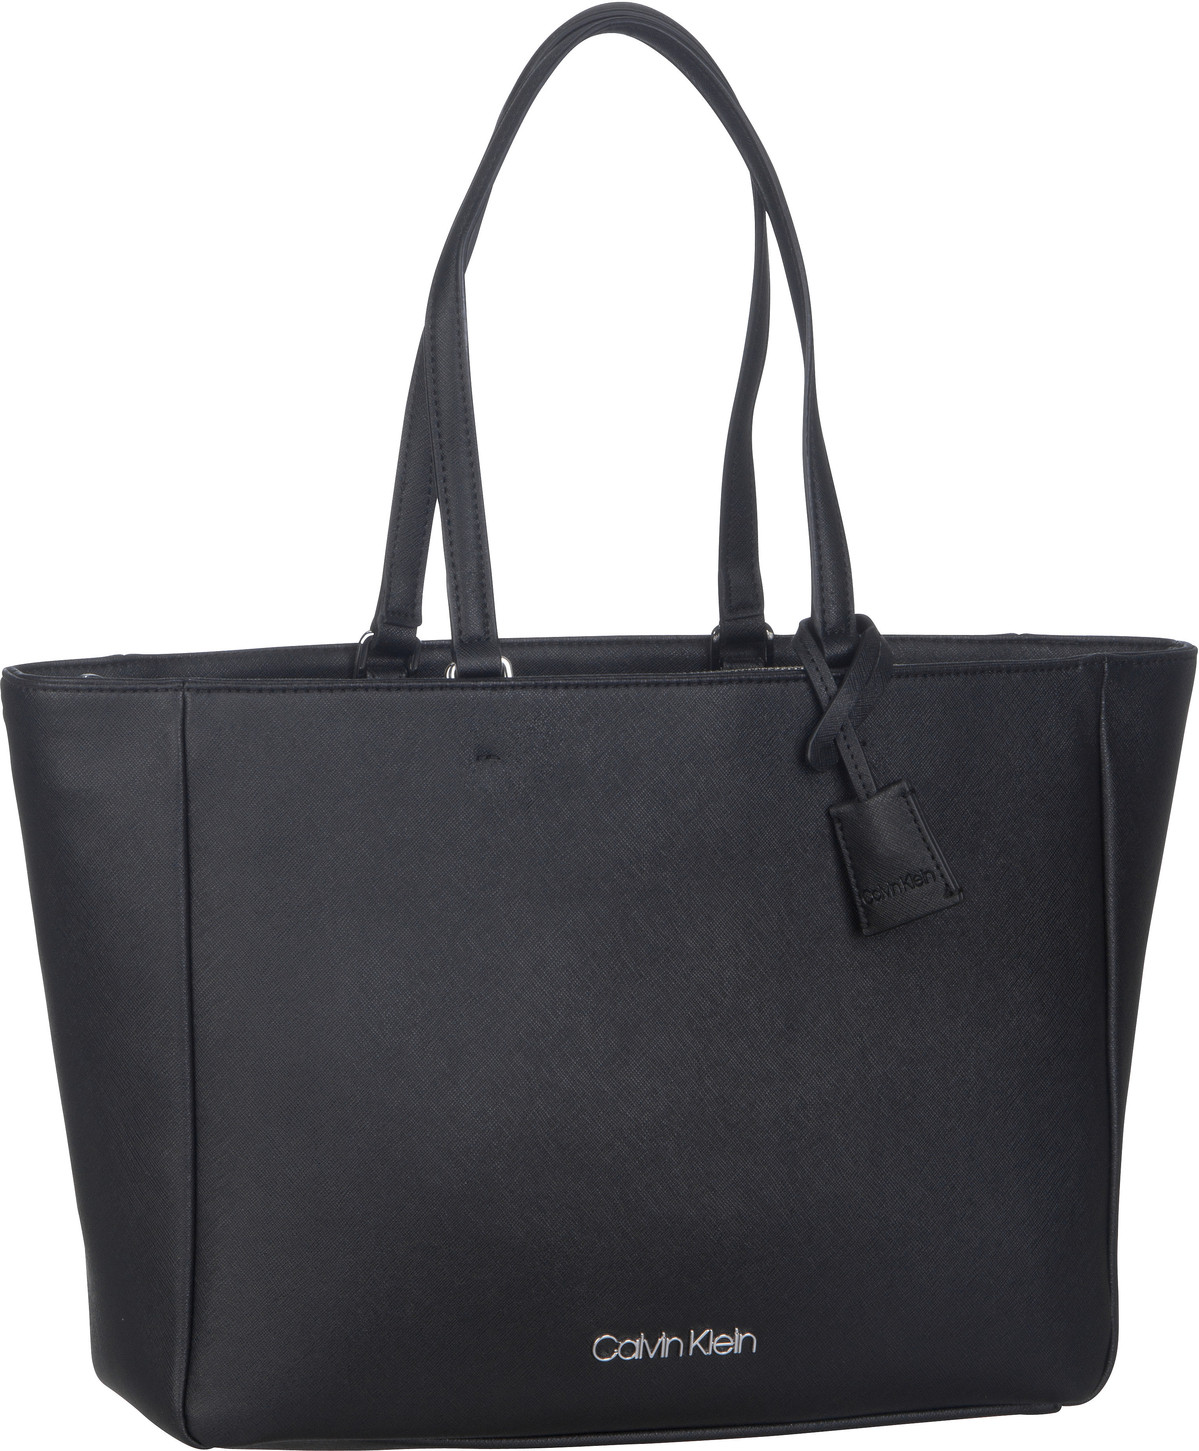 Shopper CK Task Shopper Black